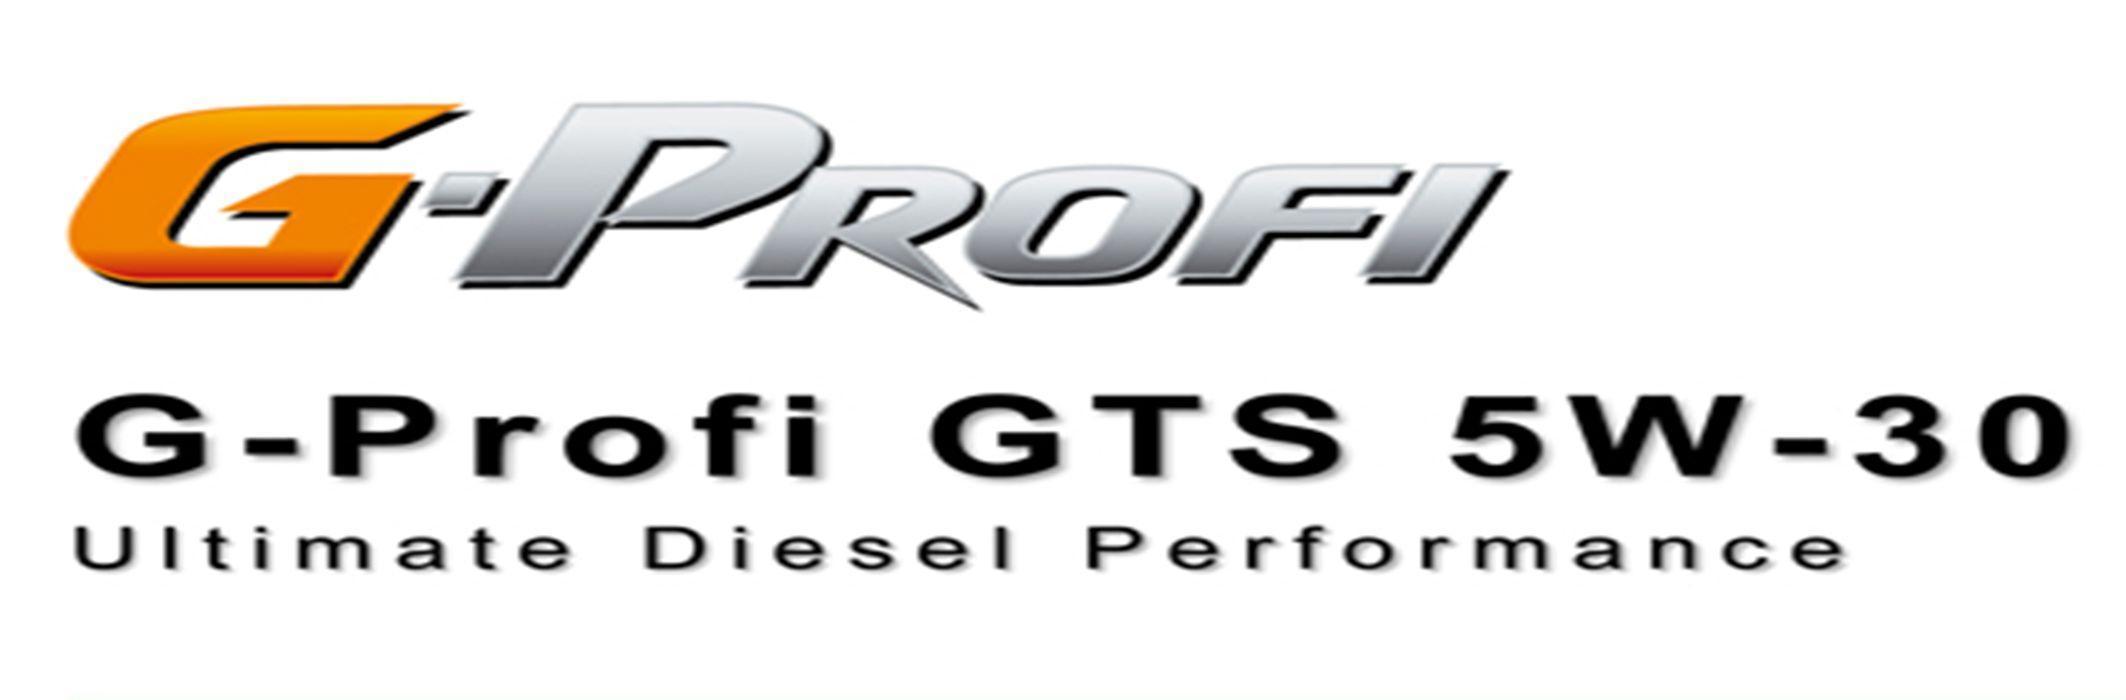 Купить моторное масло G-Profi GTS 5W-30